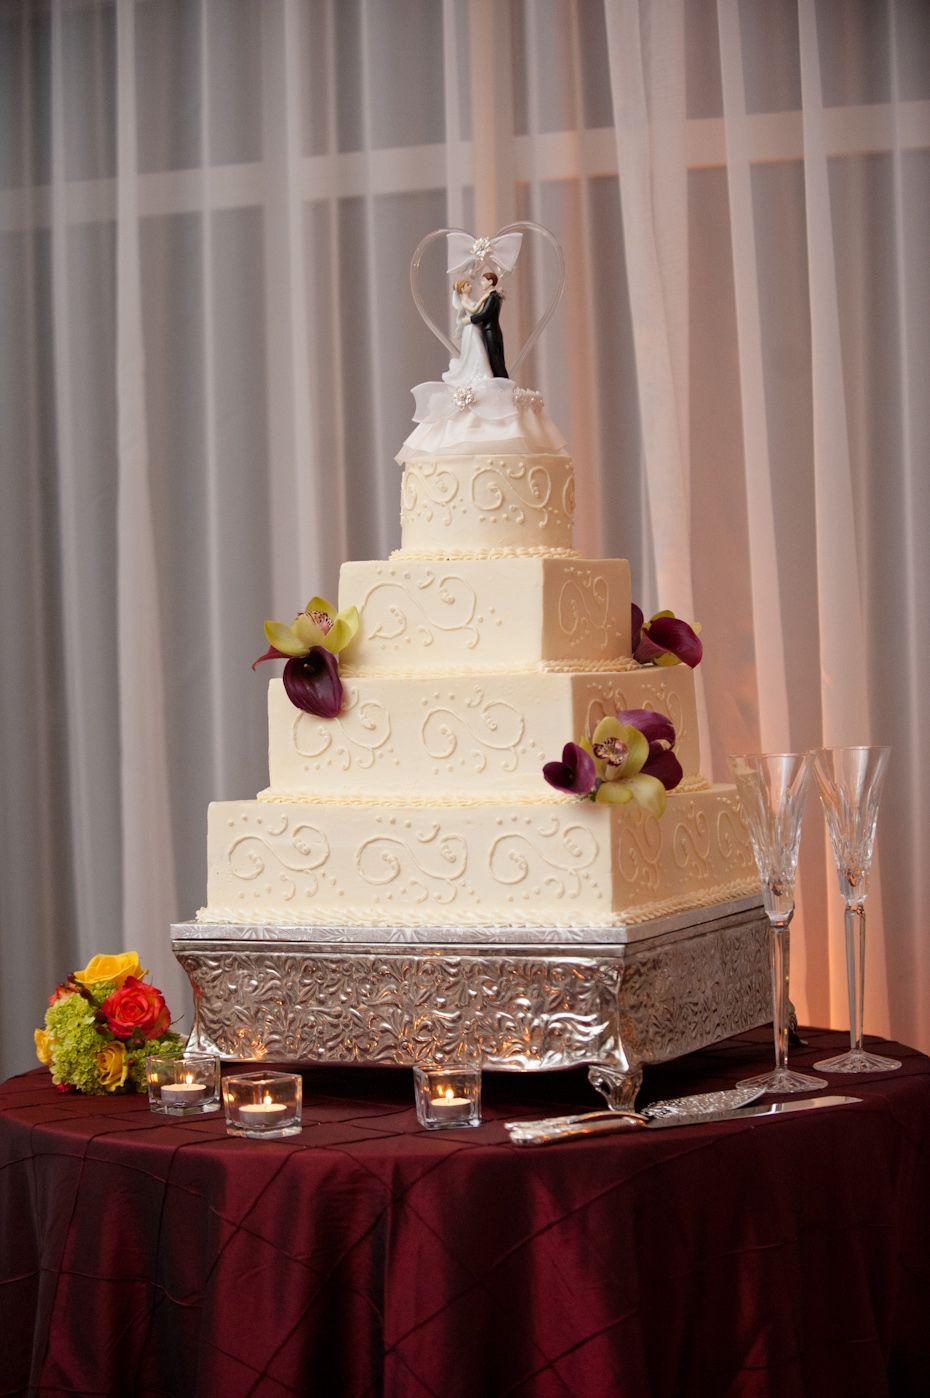 Villa christina wedding orchids wedding cake decor ivory